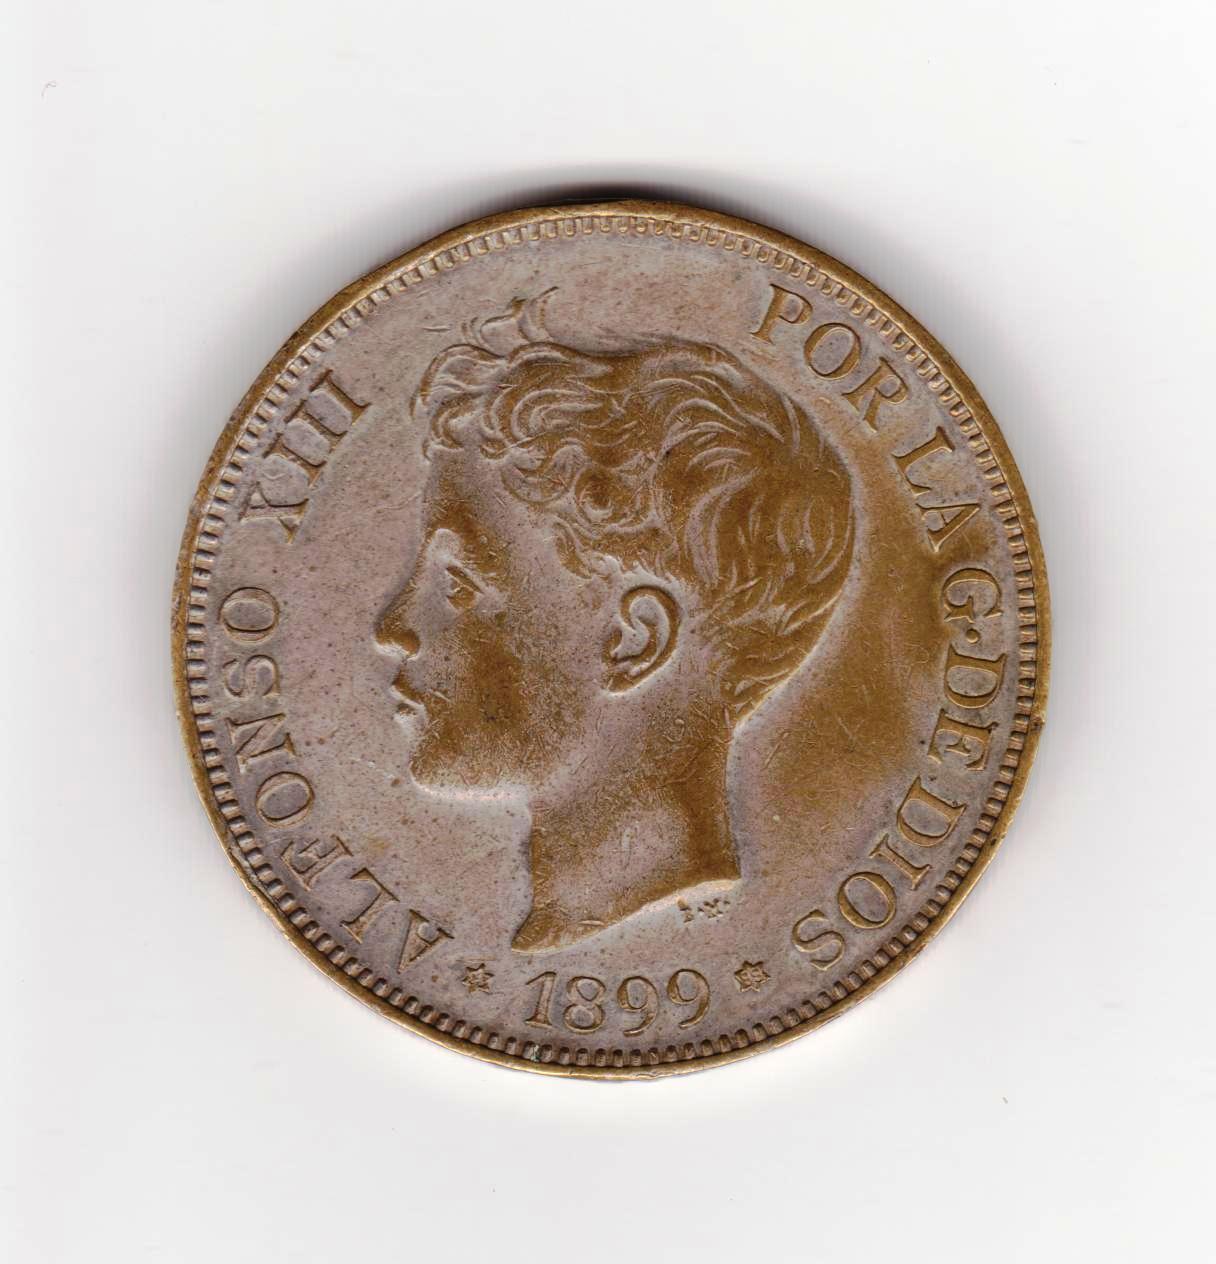 5 pesetas 1899, latón plateado 5_pesetas_1899_falas_epoca